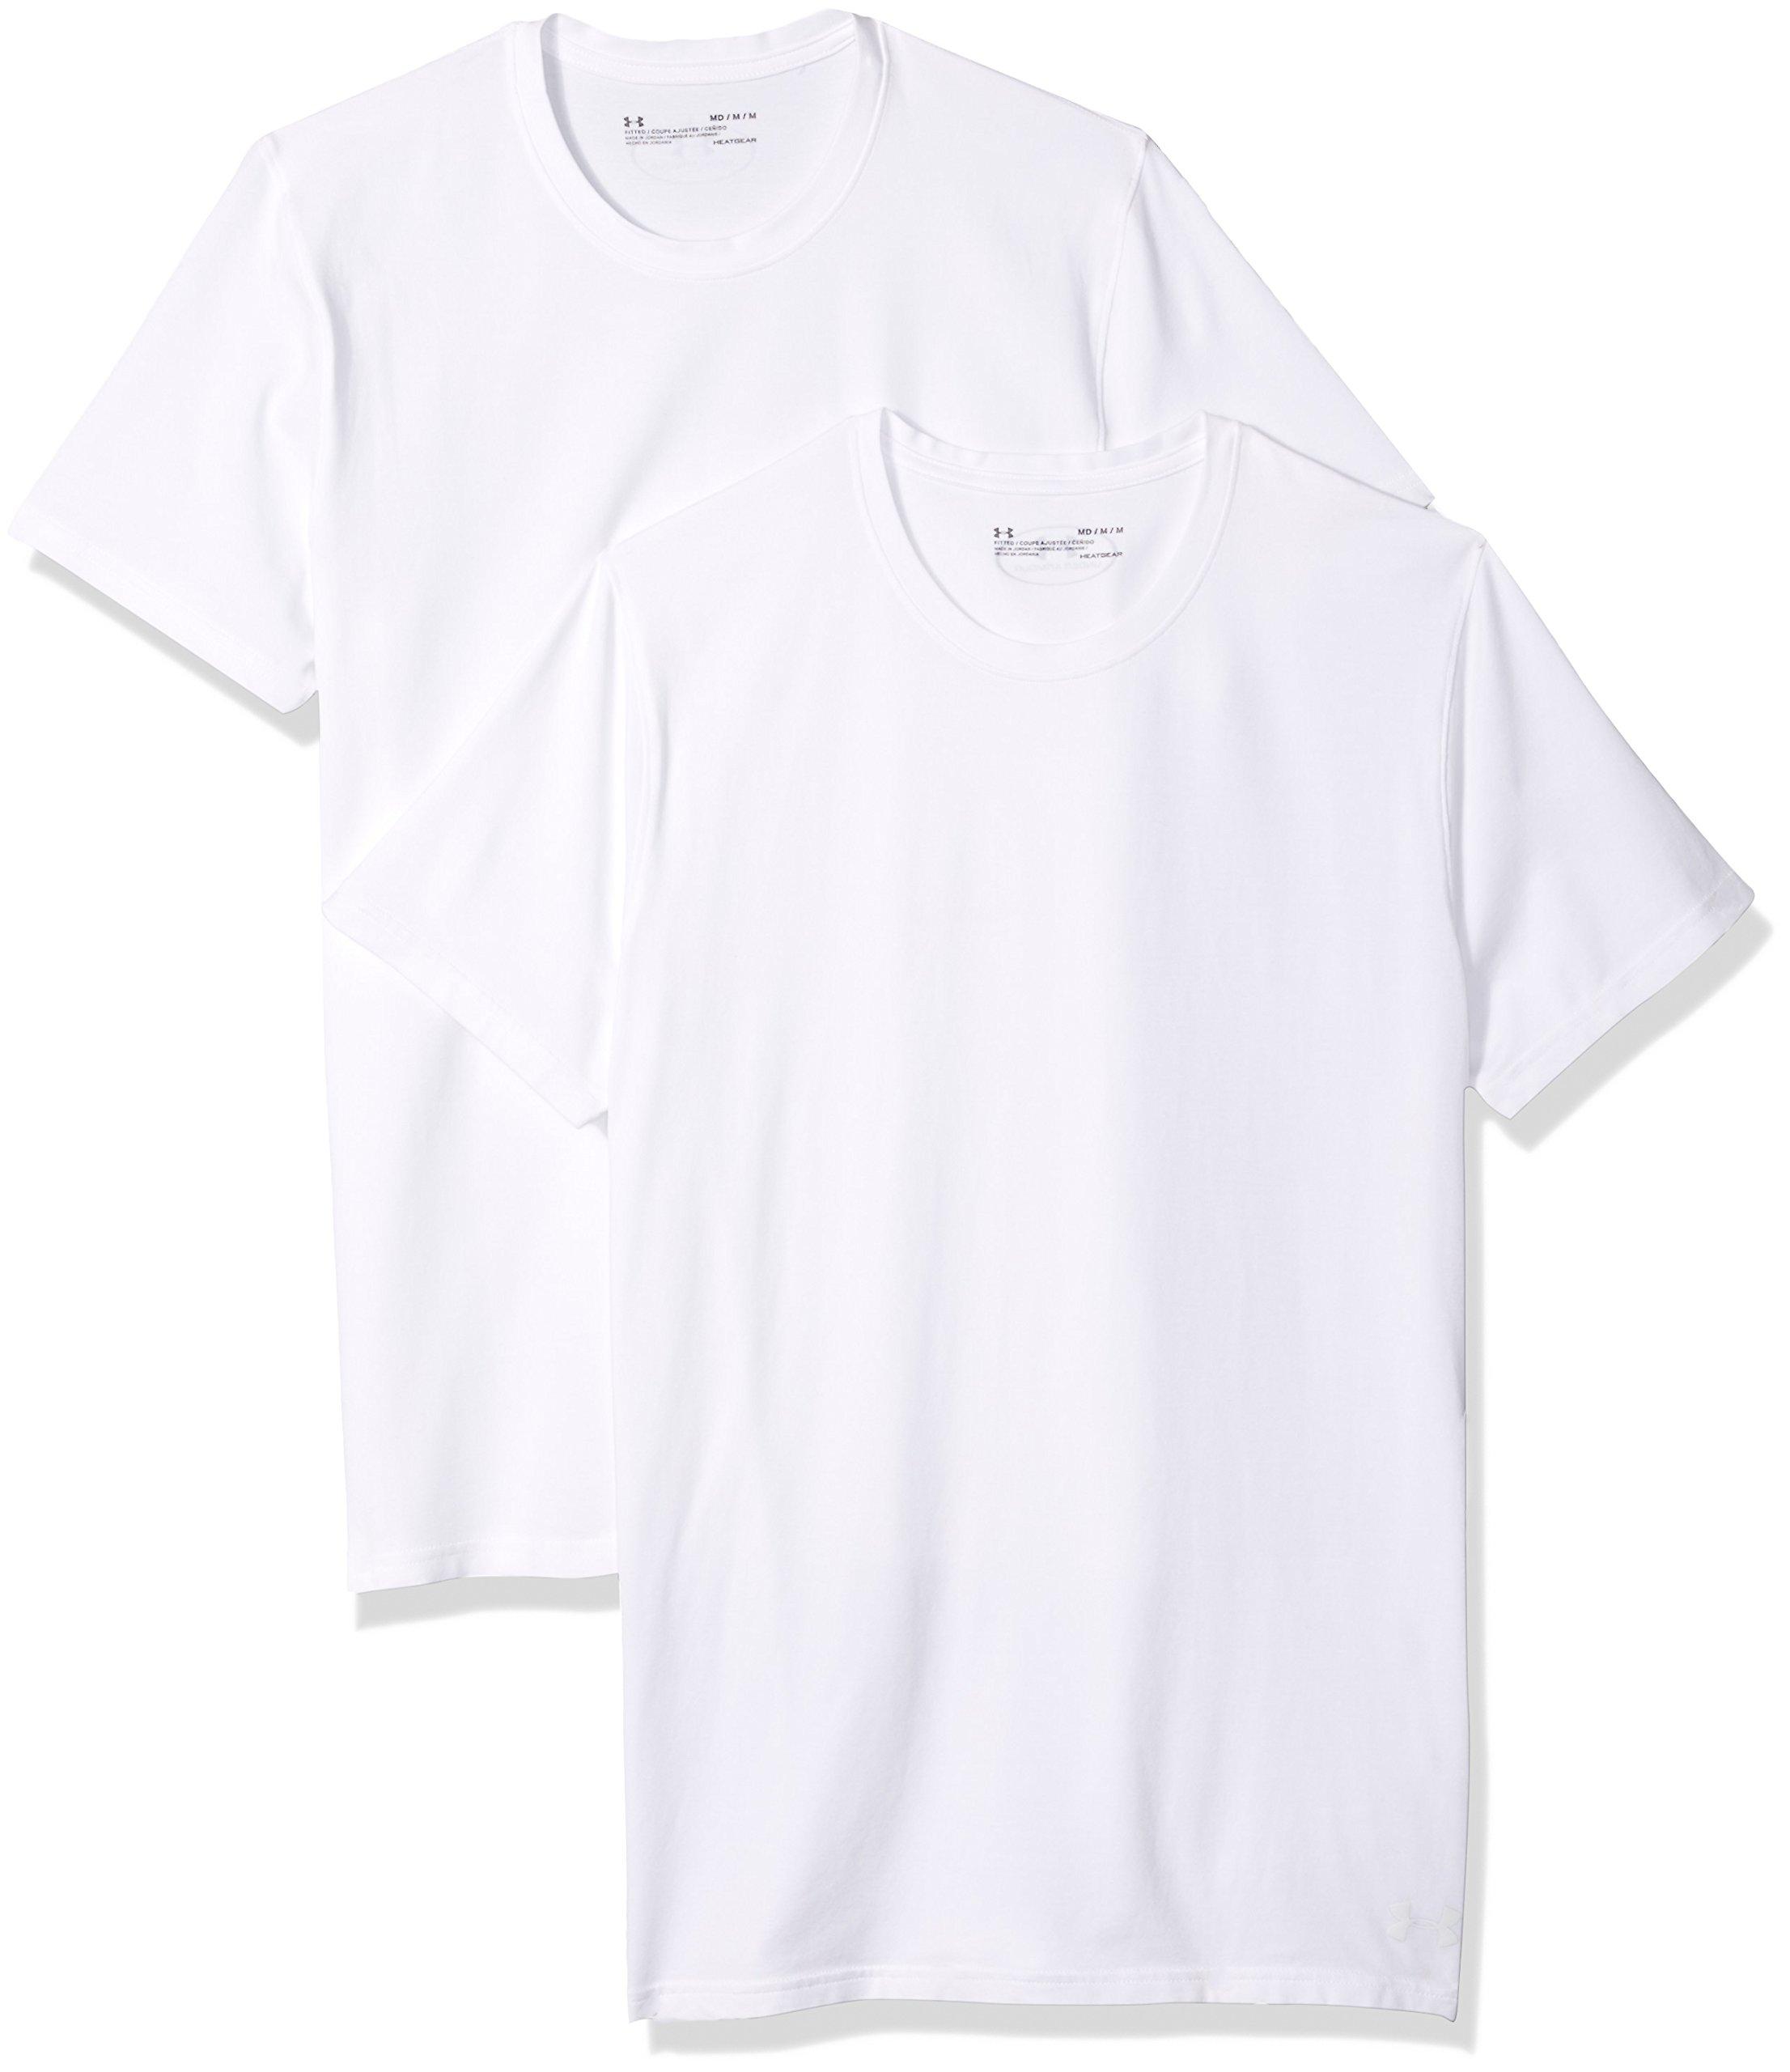 Under Armour Men's Cotton Stretch Crew Undershirt – 2-Pack,White (100)/White, Medium